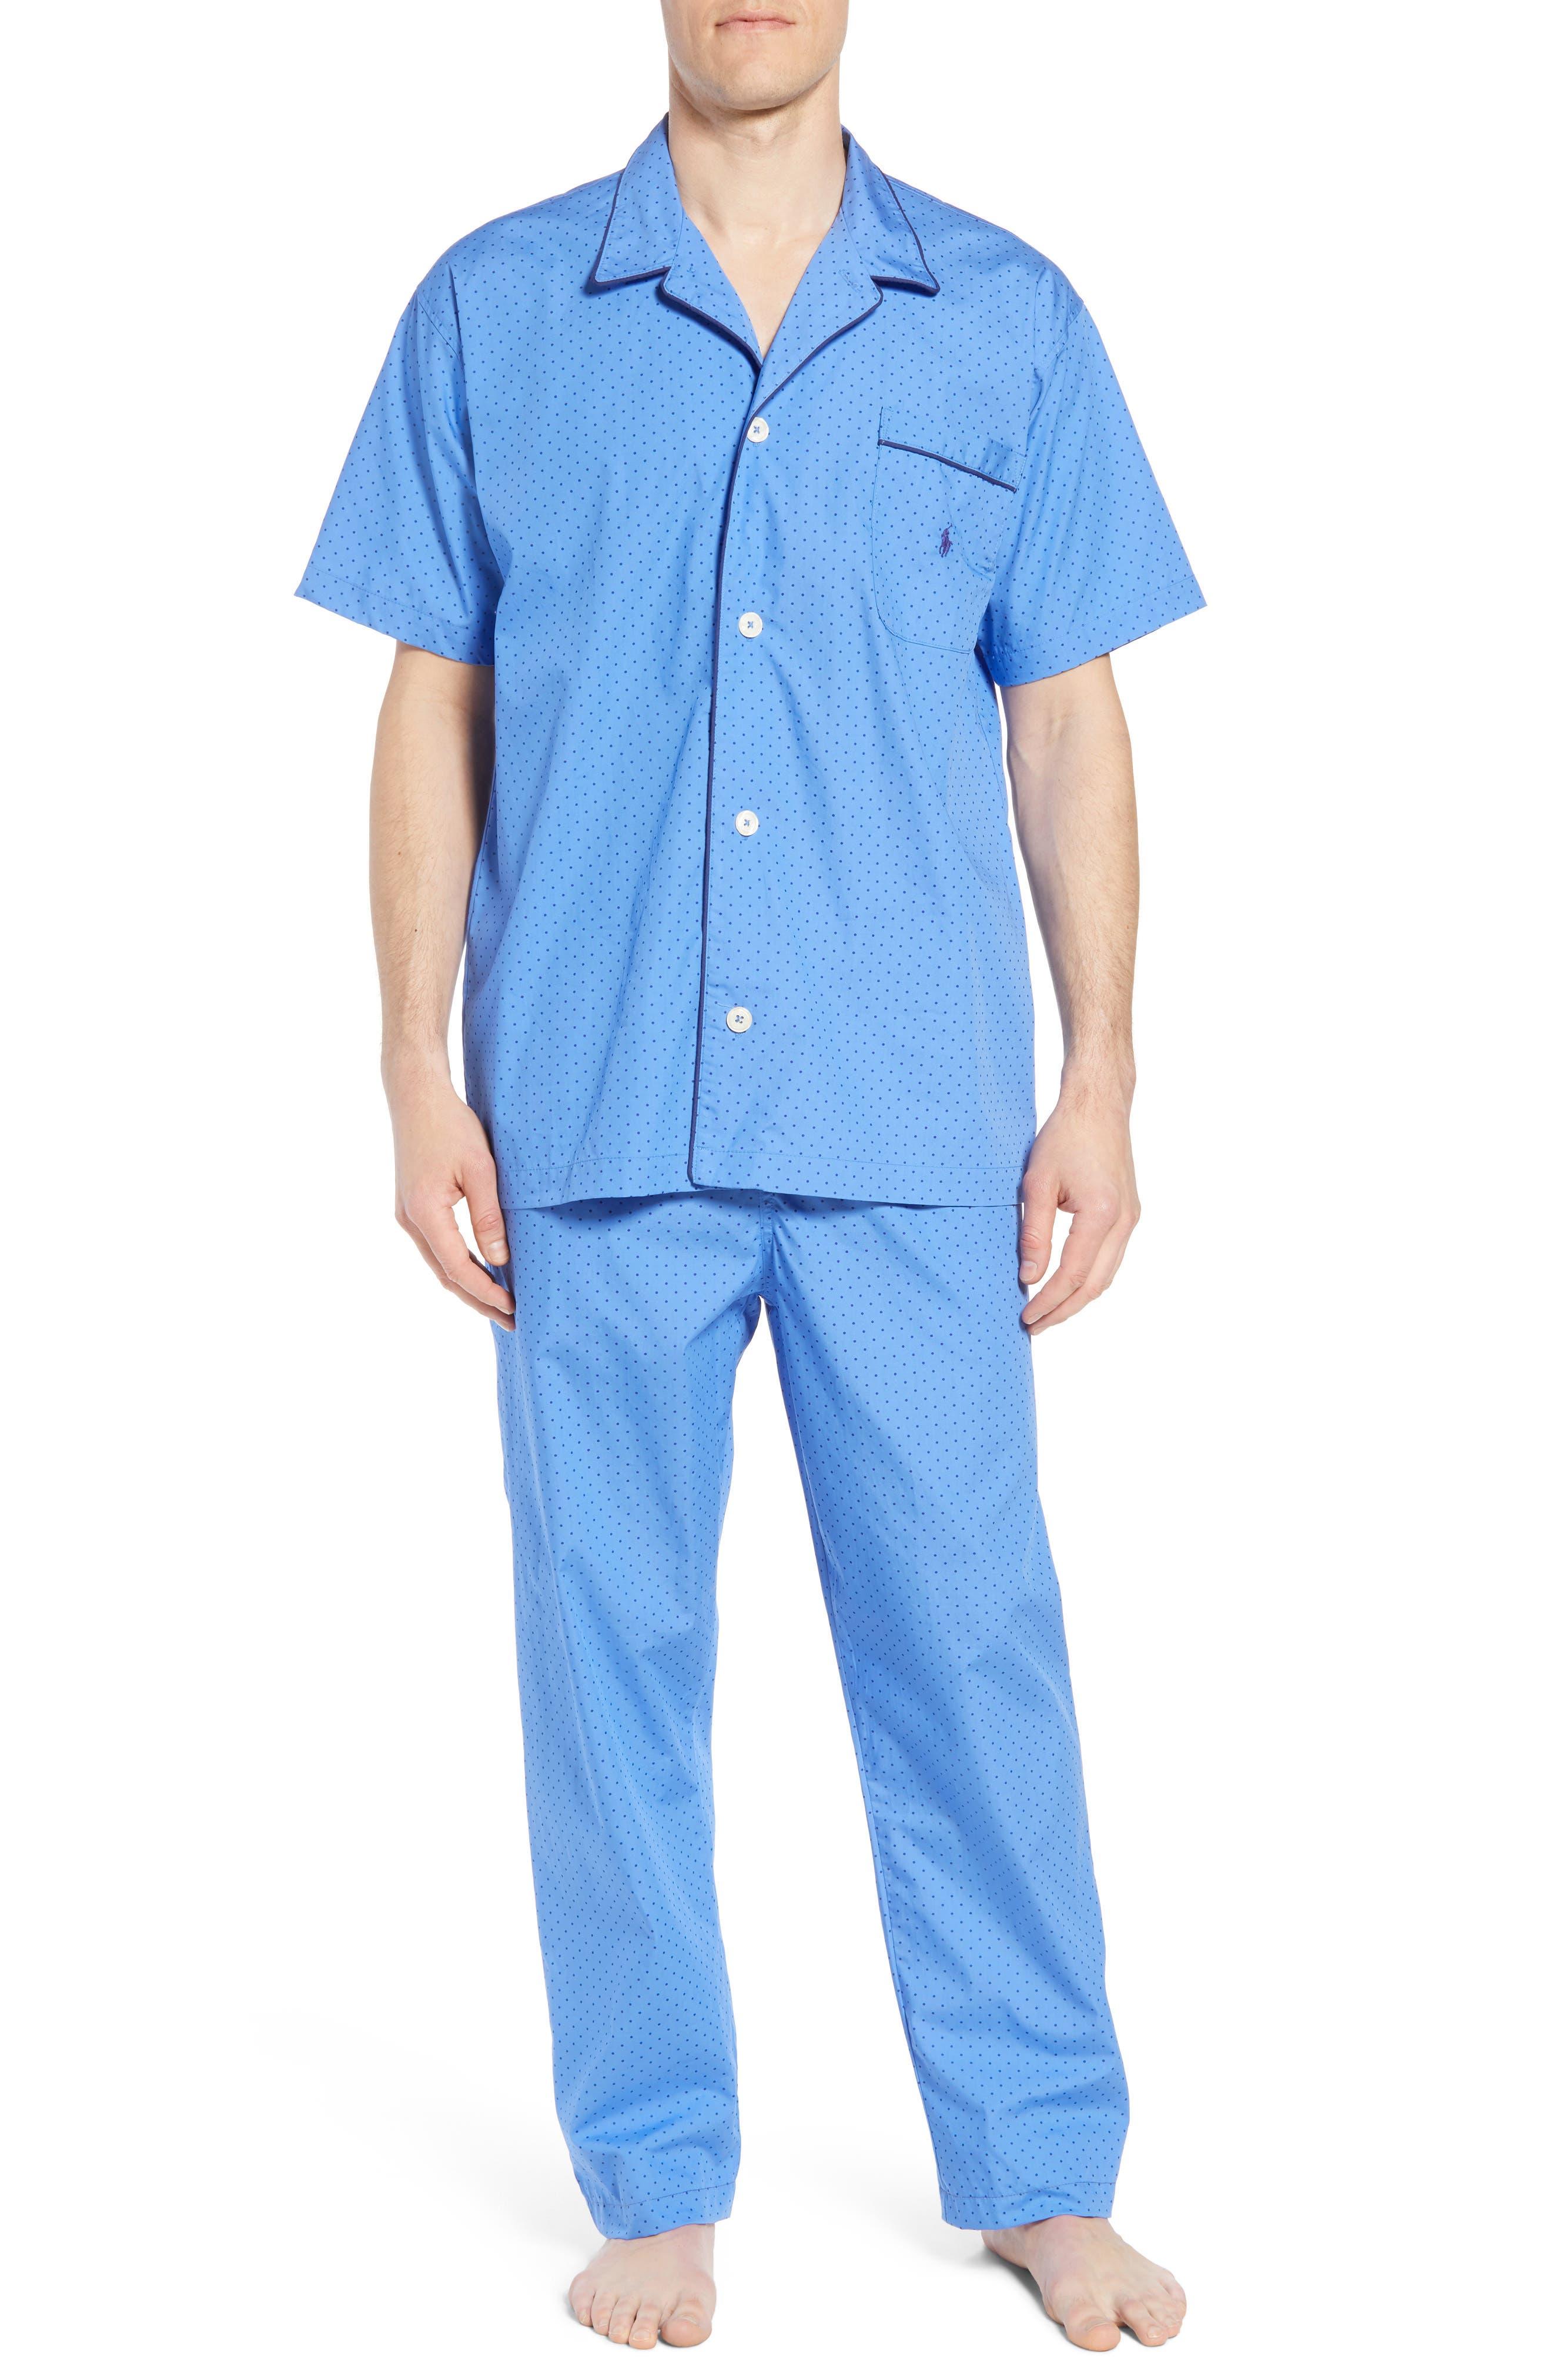 POLO RALPH LAUREN,                             Dot Cotton Pajama Shirt,                             Alternate thumbnail 6, color,                             451